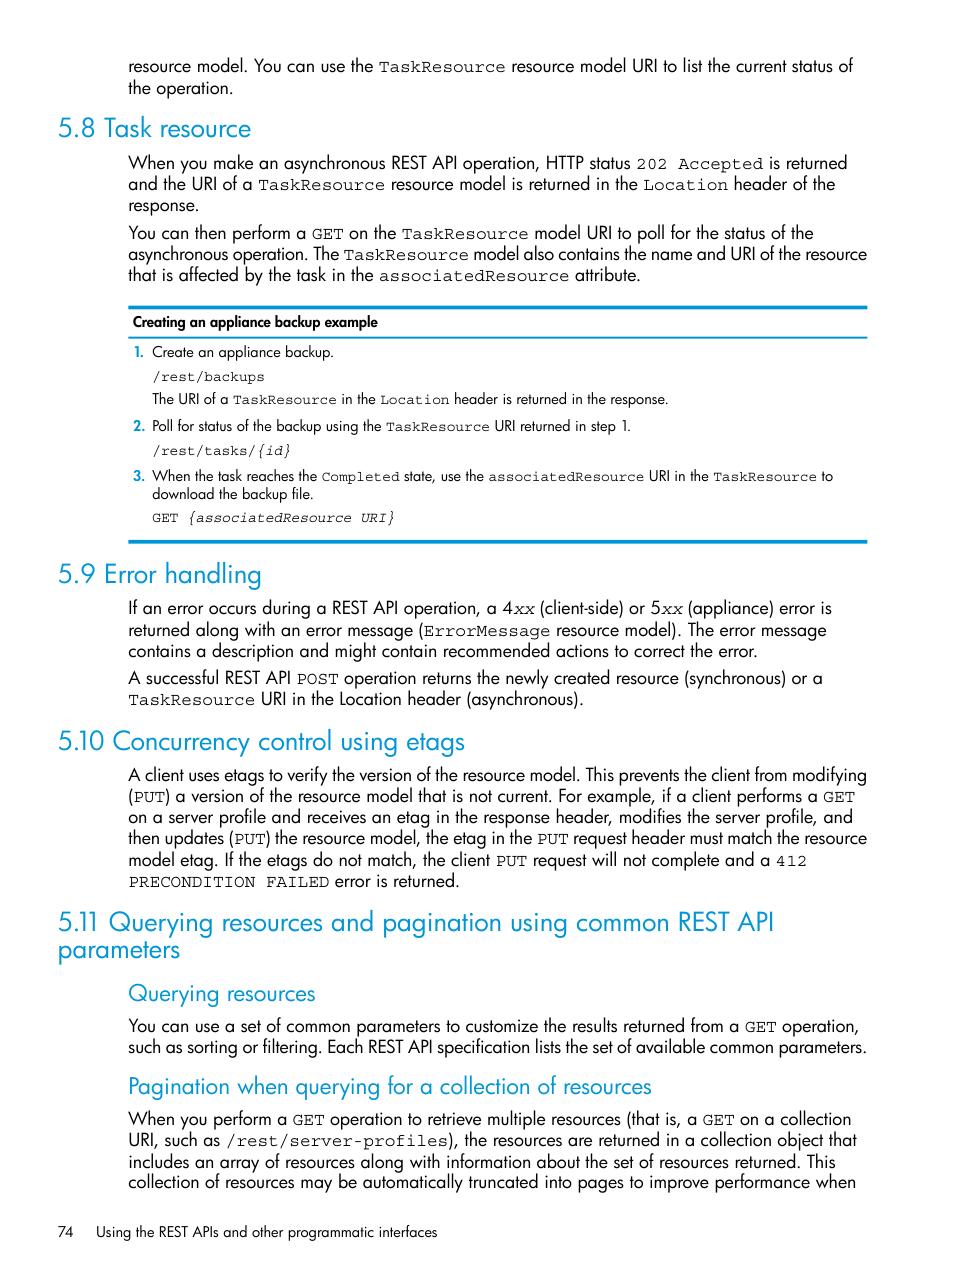 8 task resource, 9 error handling, 10 concurrency control